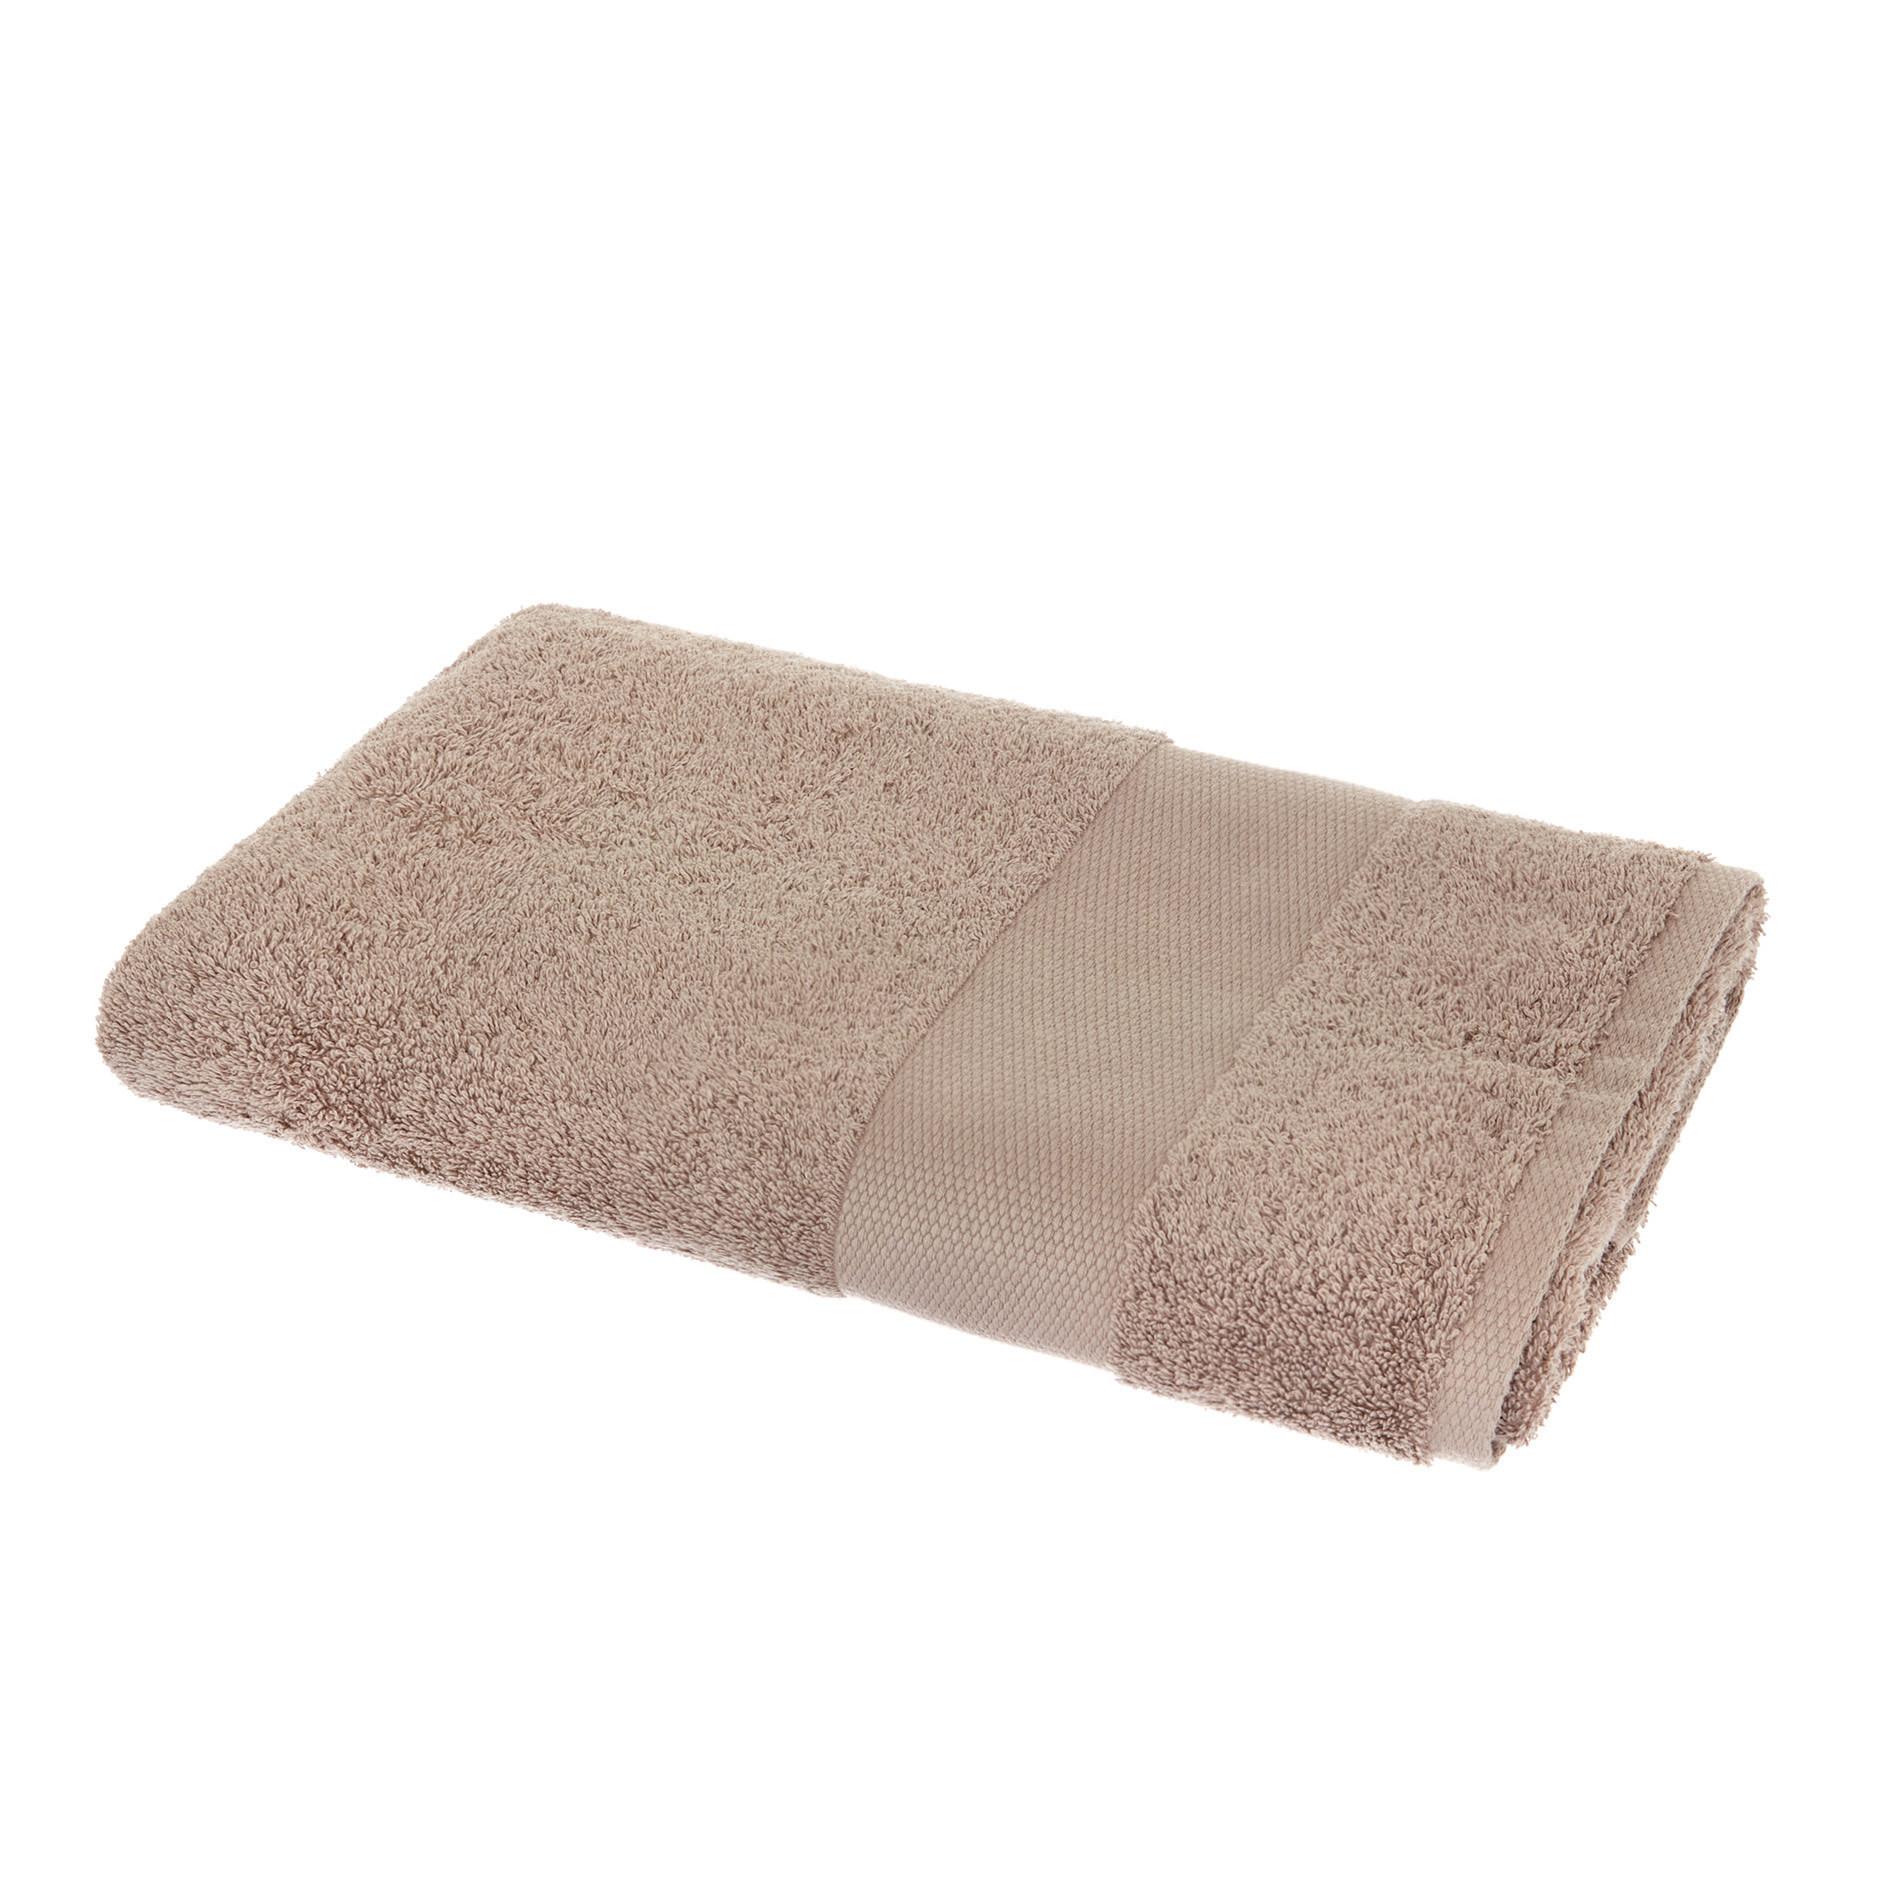 Asciugamano spugna di puro cotone Zefiro, Marrone, large image number 1